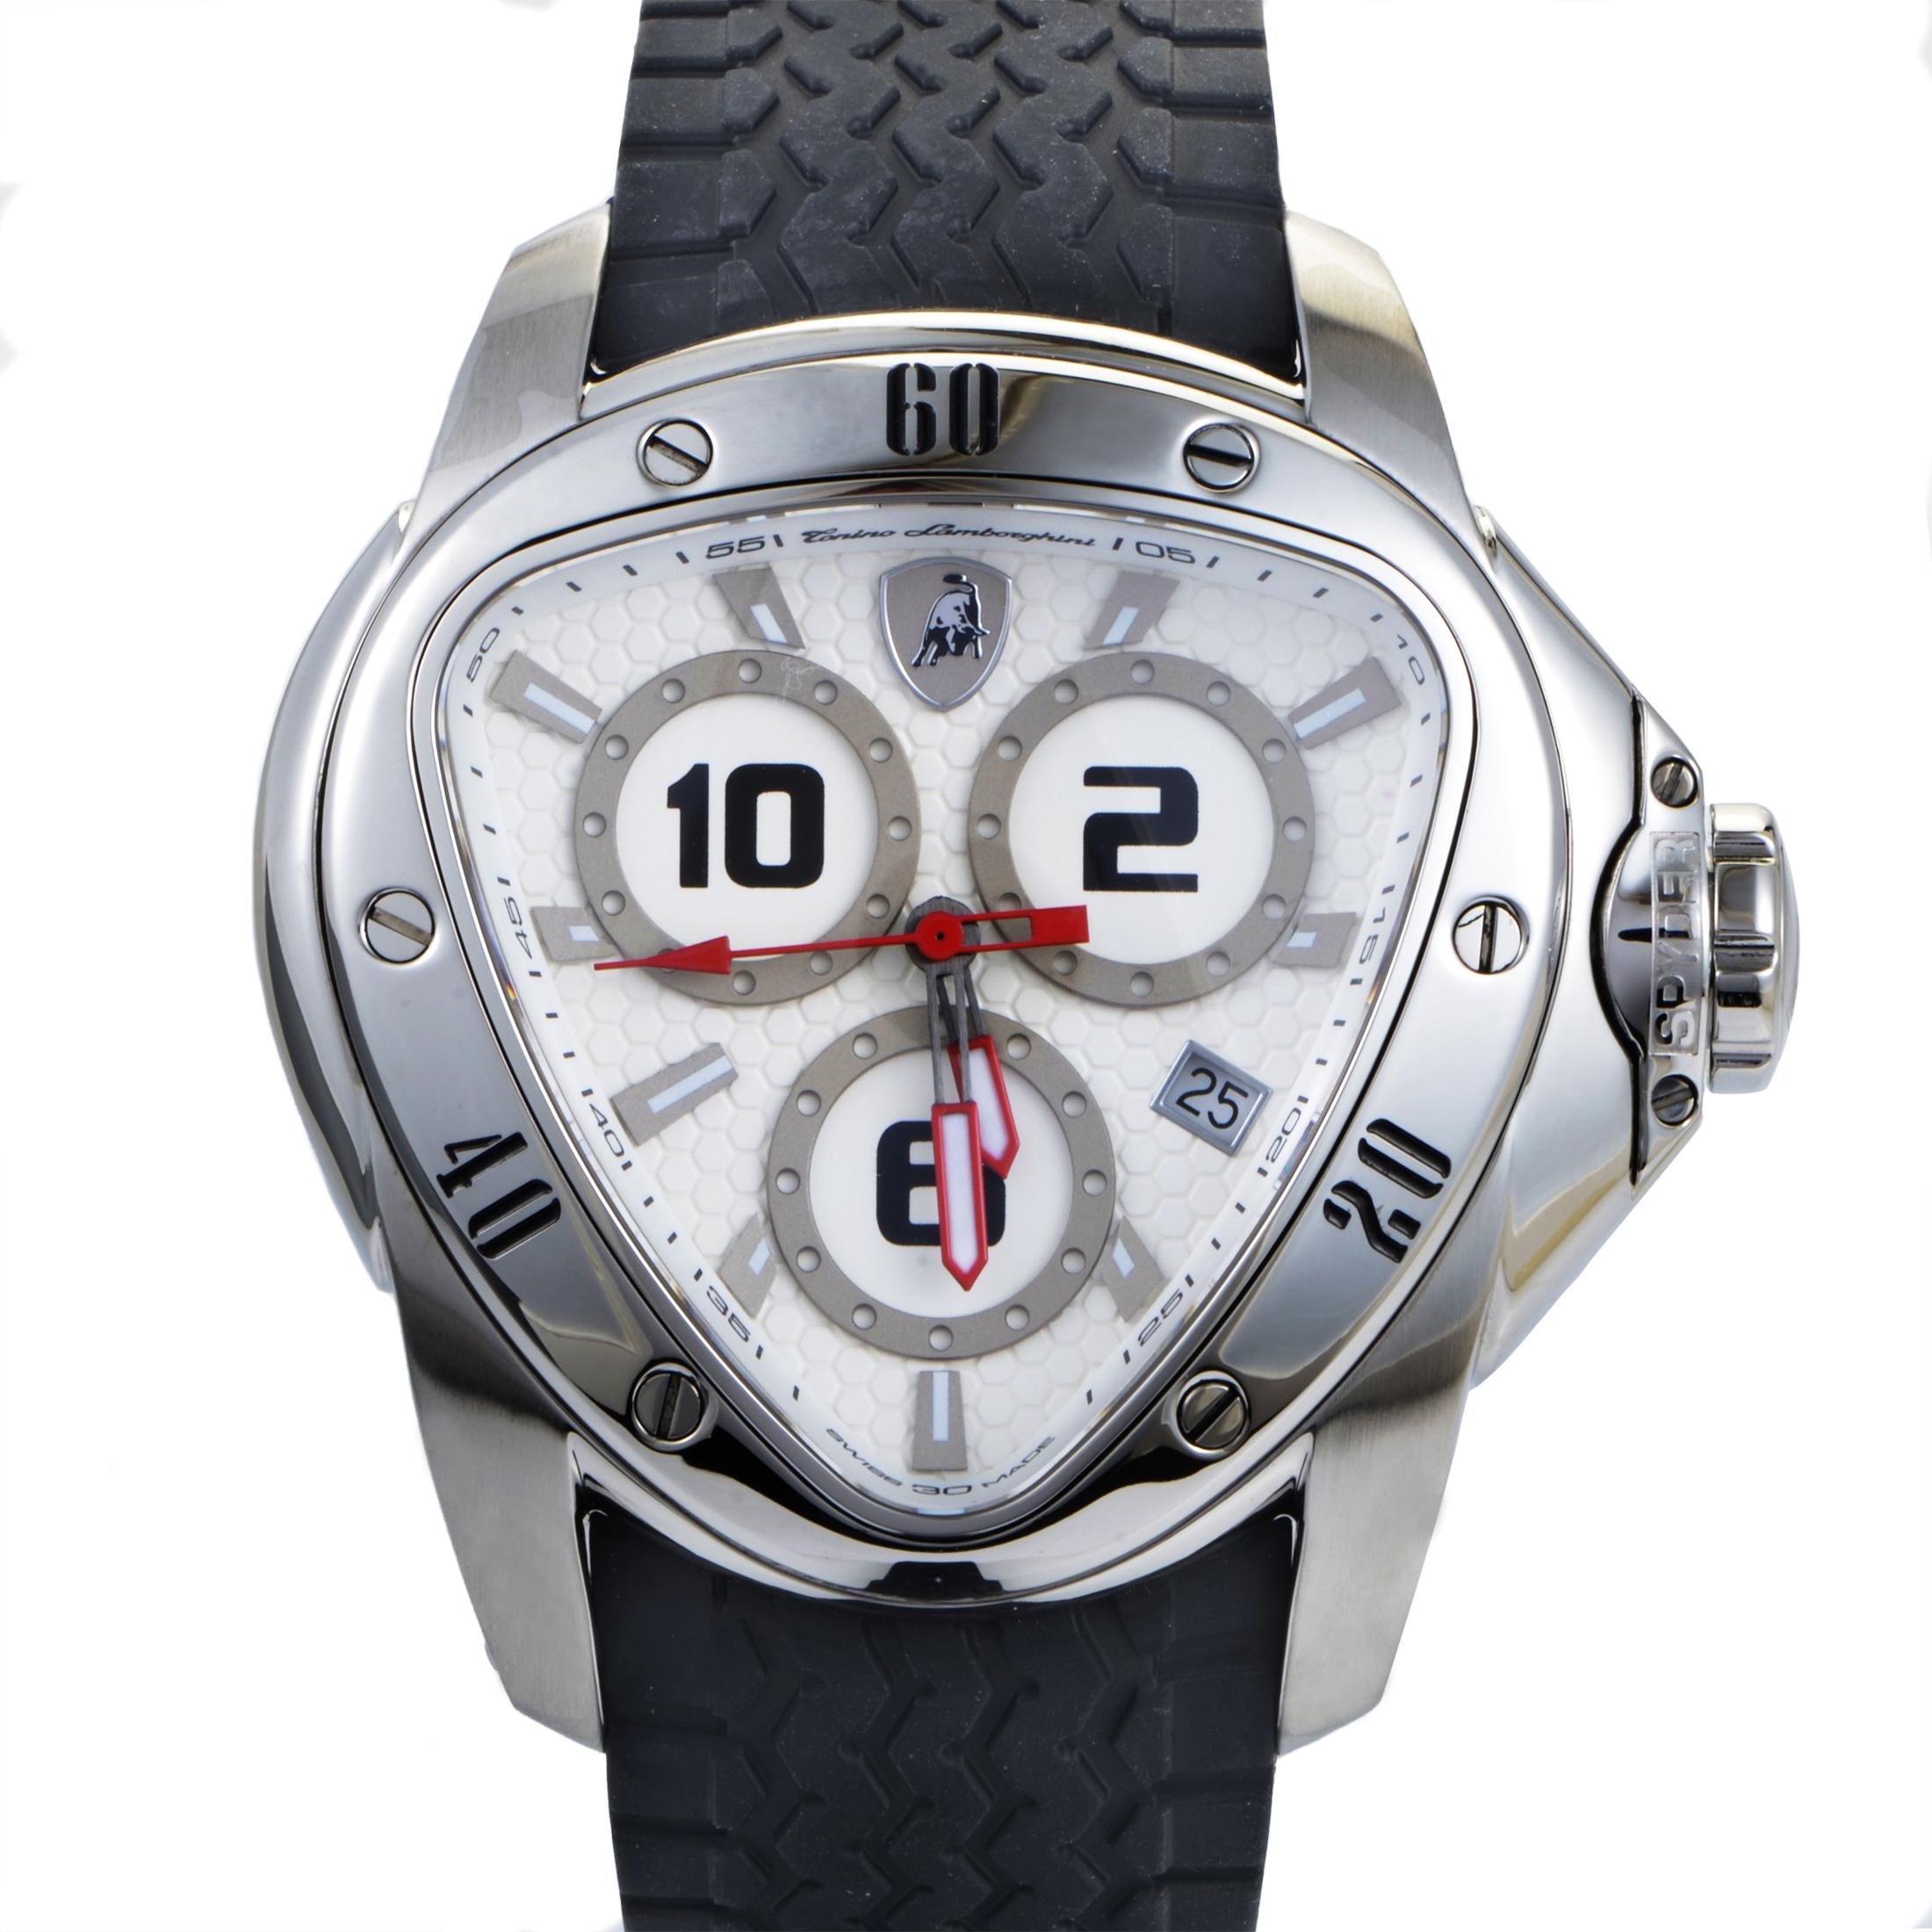 Spyder Men's Quartz Watch 1300 1304